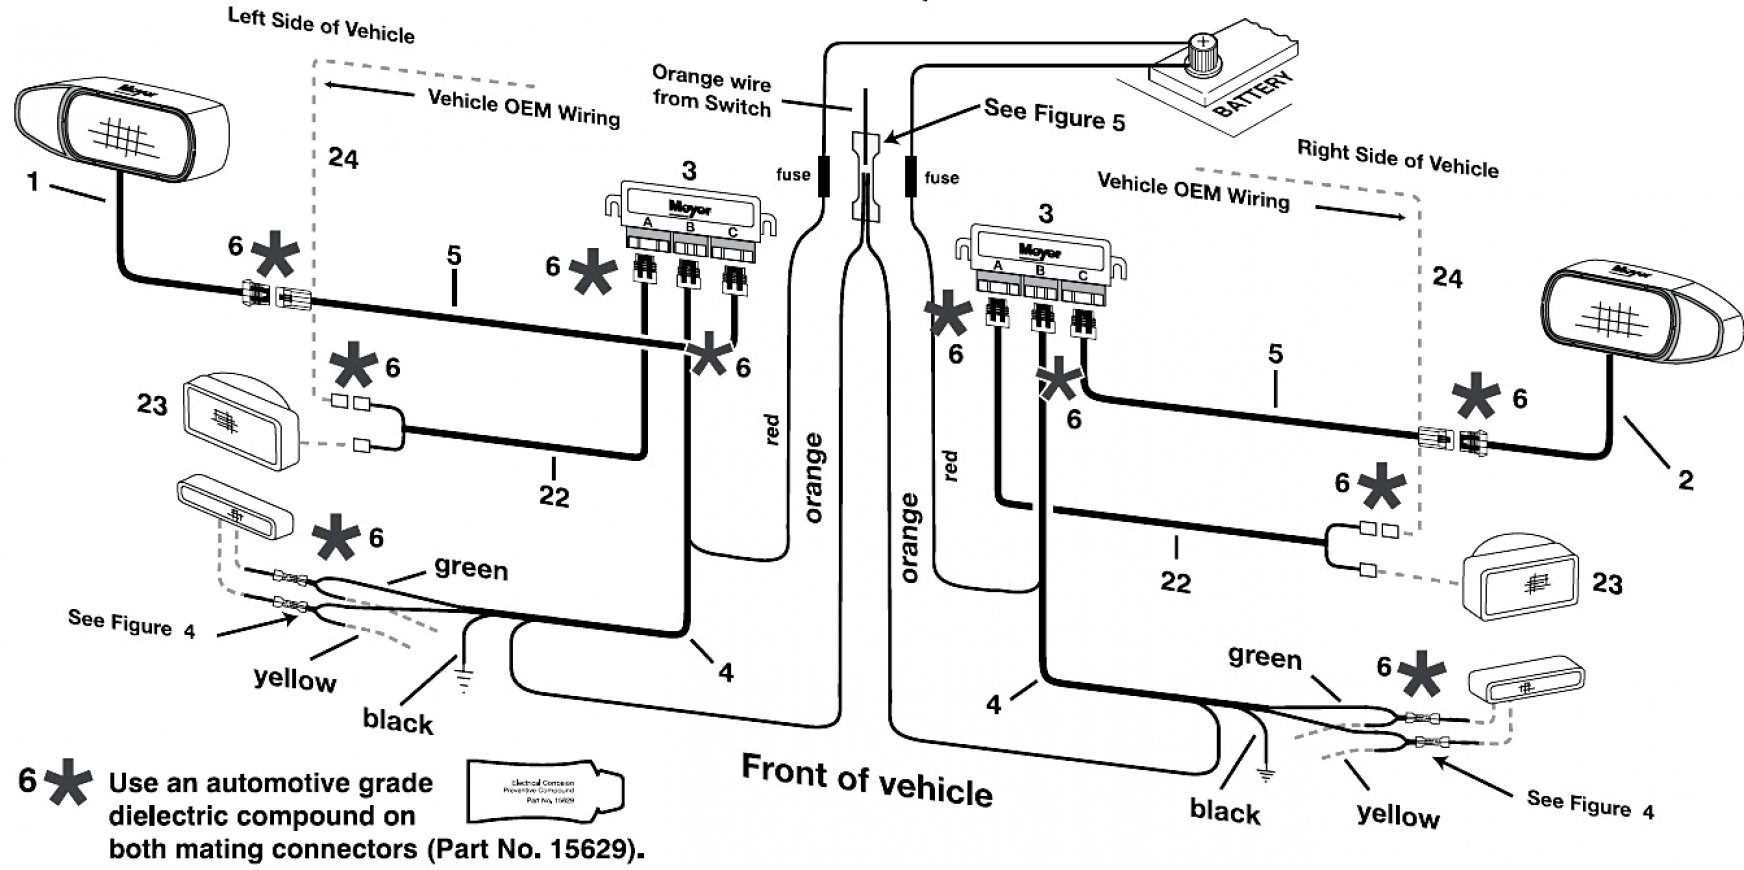 Western Snow Plows Wiring Diagram